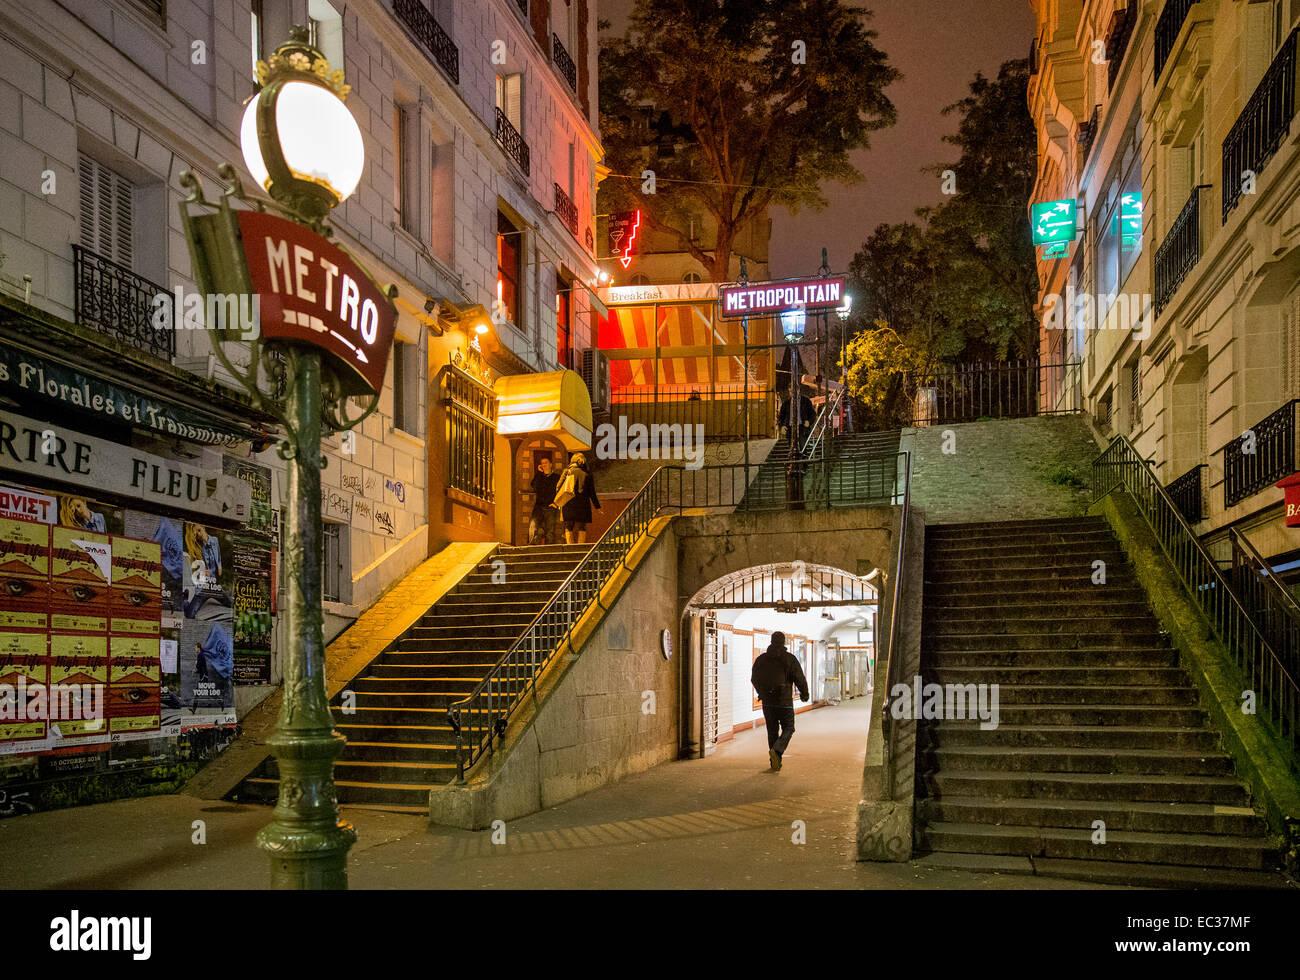 entrance metro montmartre paris france night - Stock Image